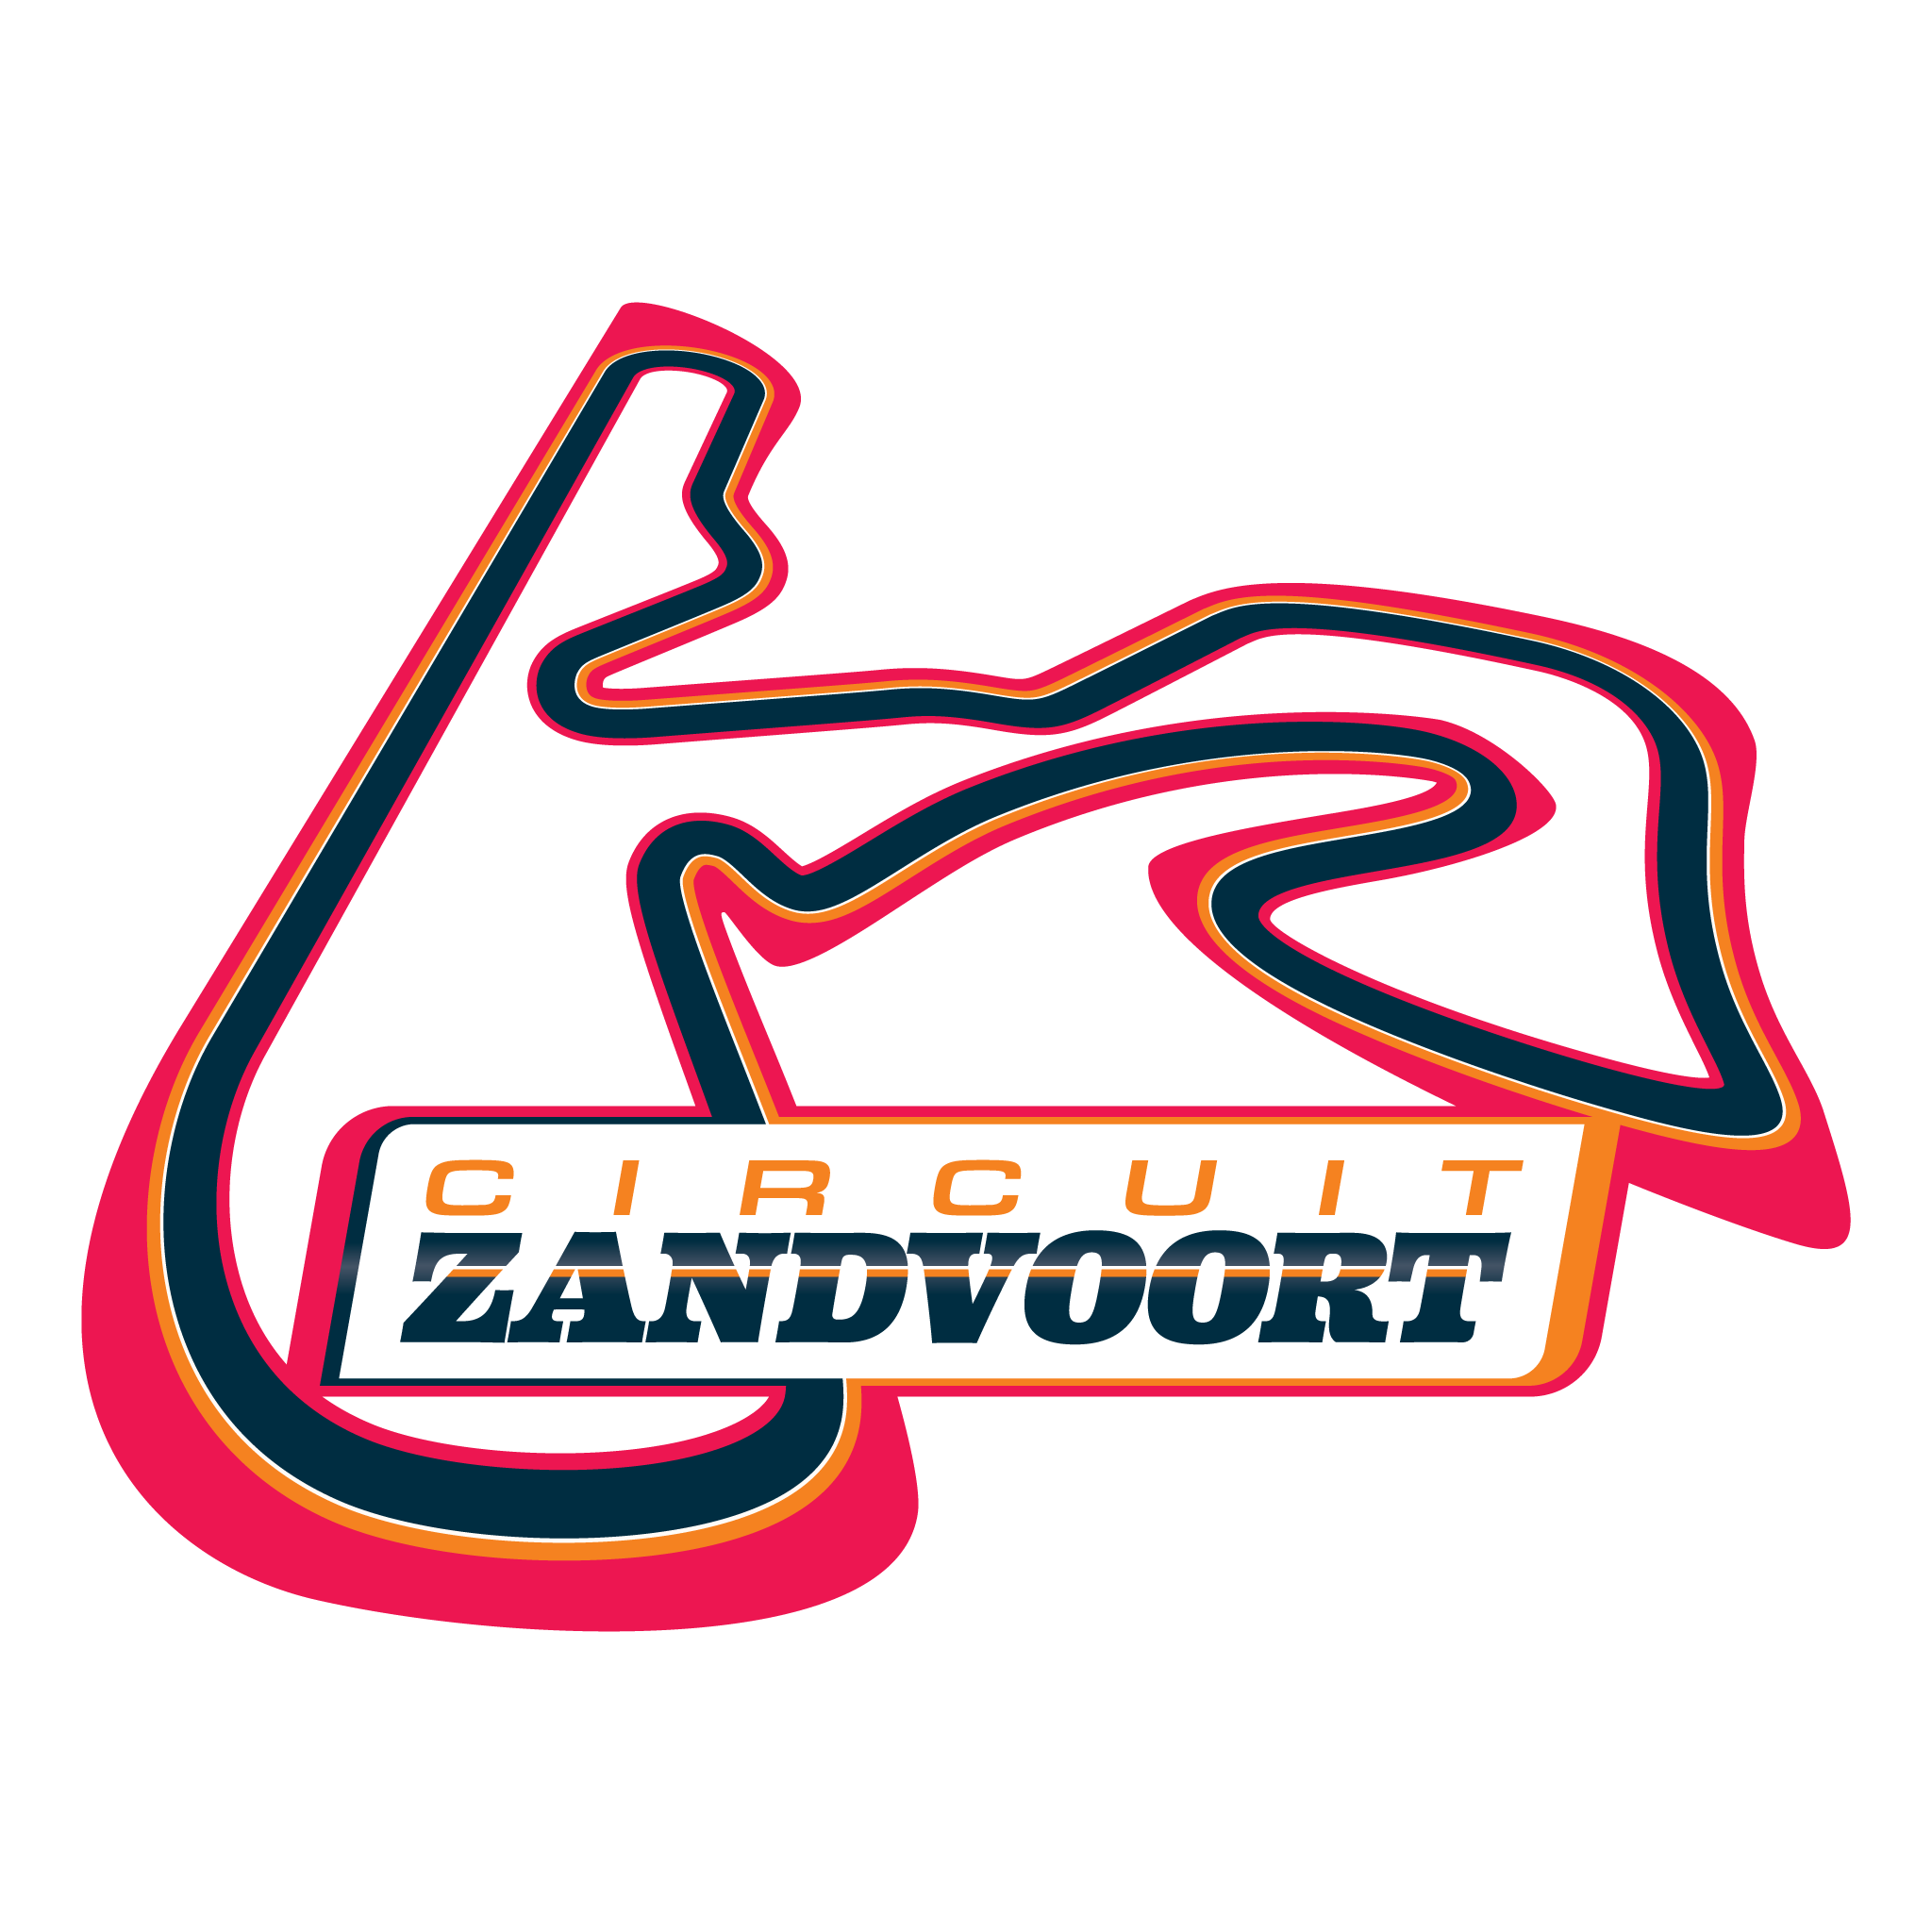 circuit-zandvoort-1677-logo-original.png